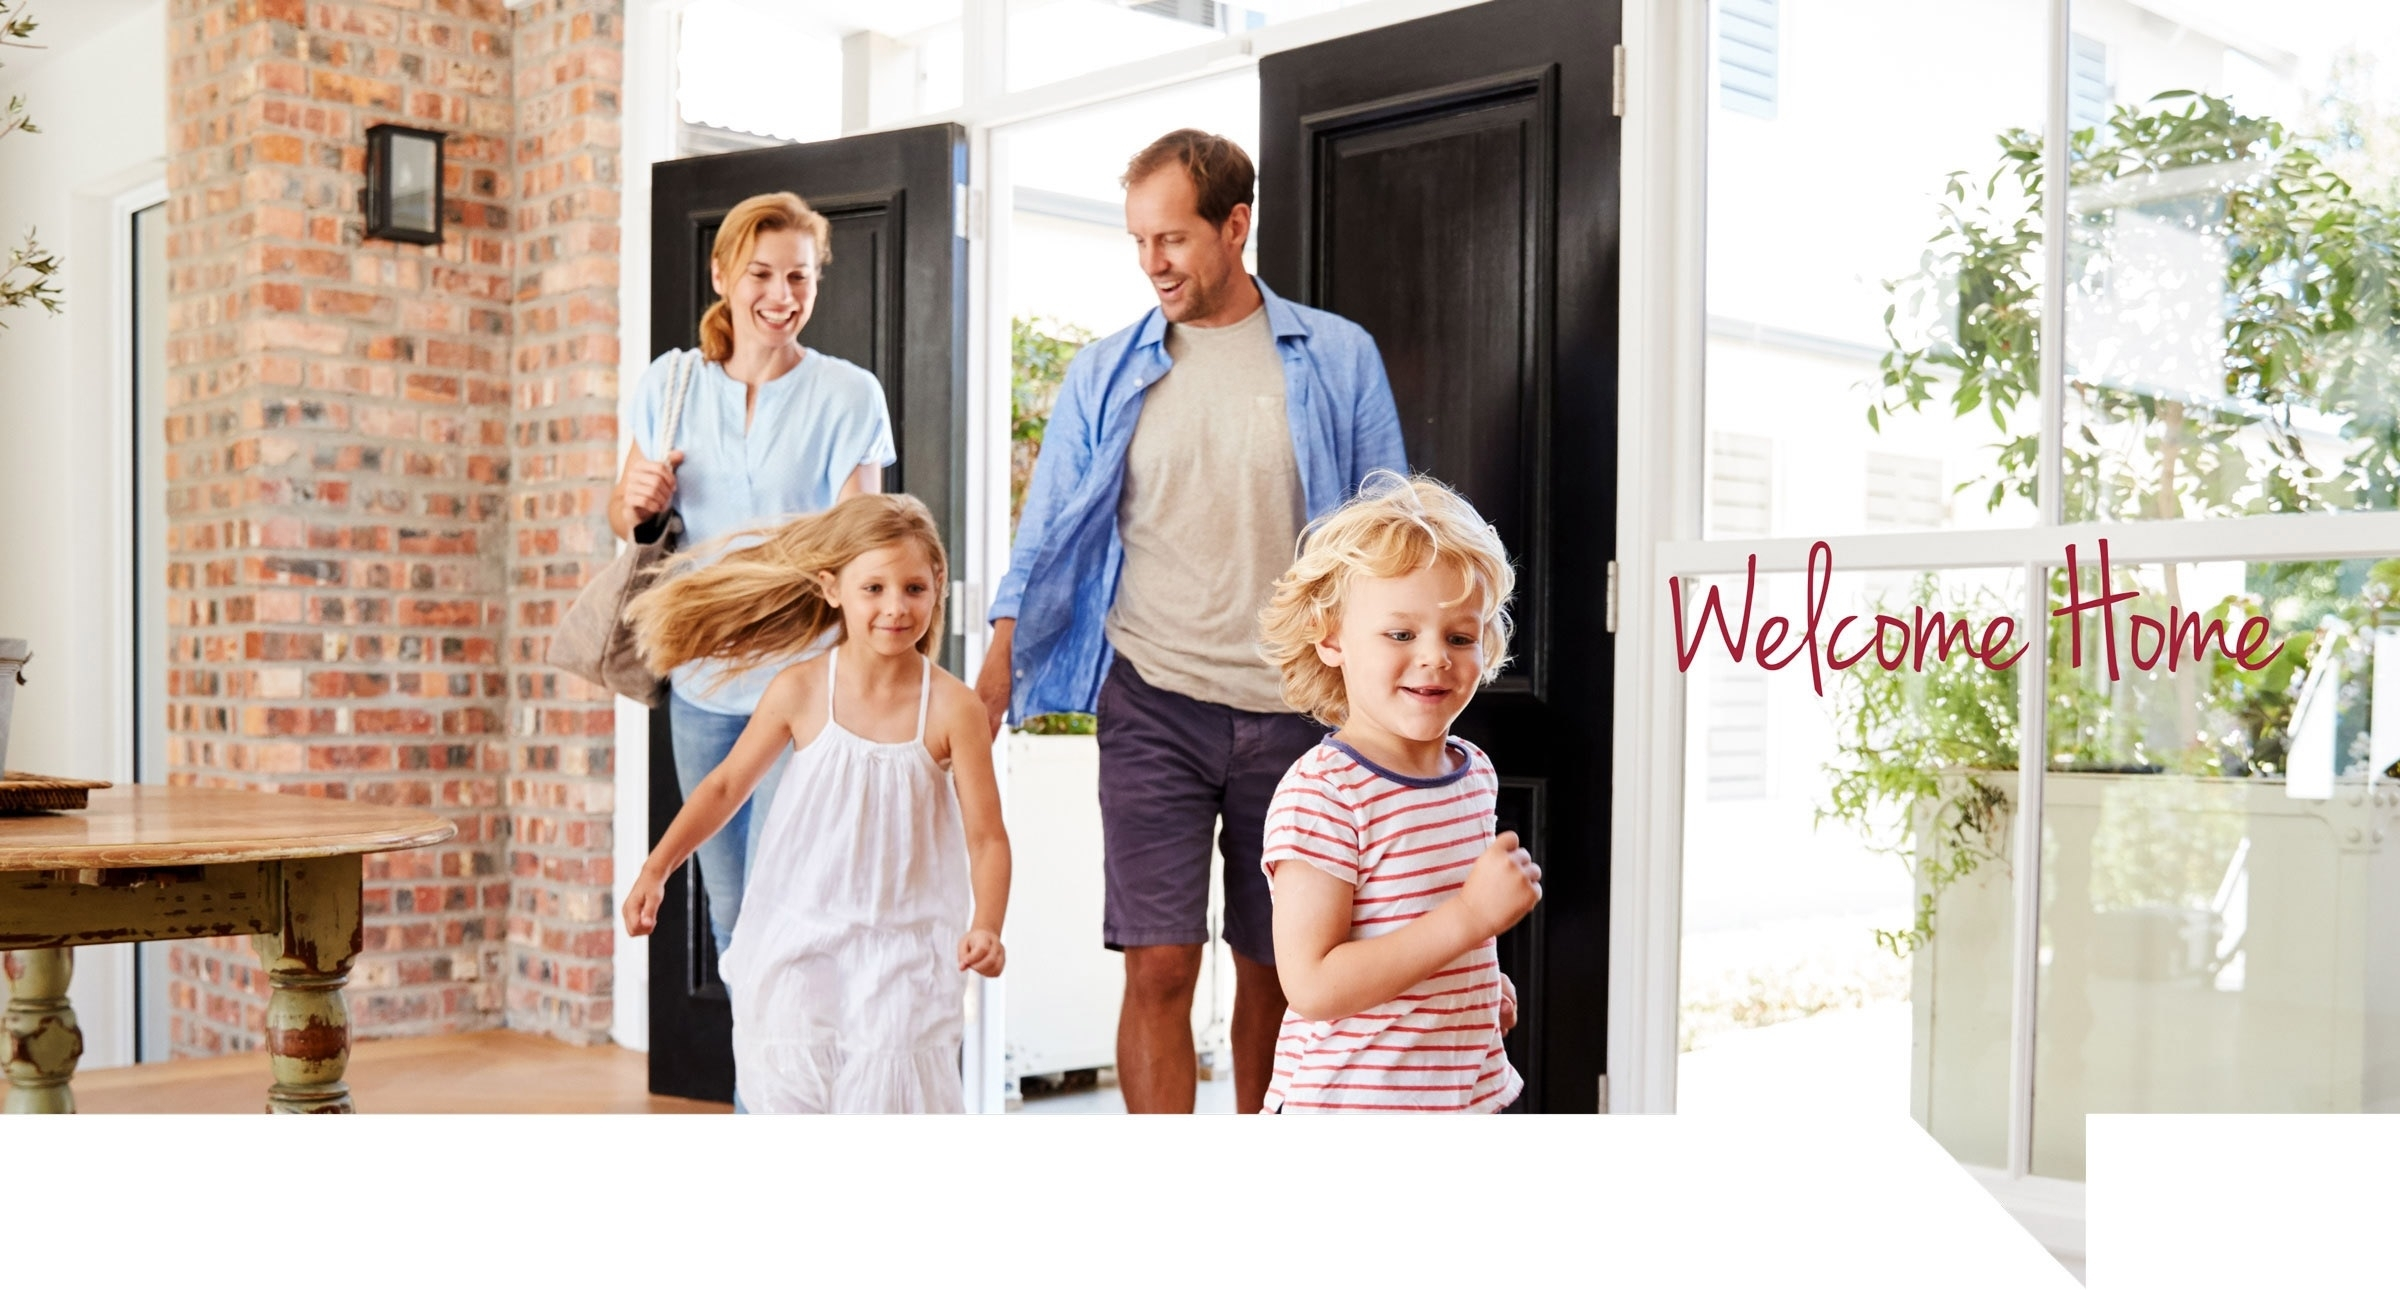 Arch Mortgage slide #1